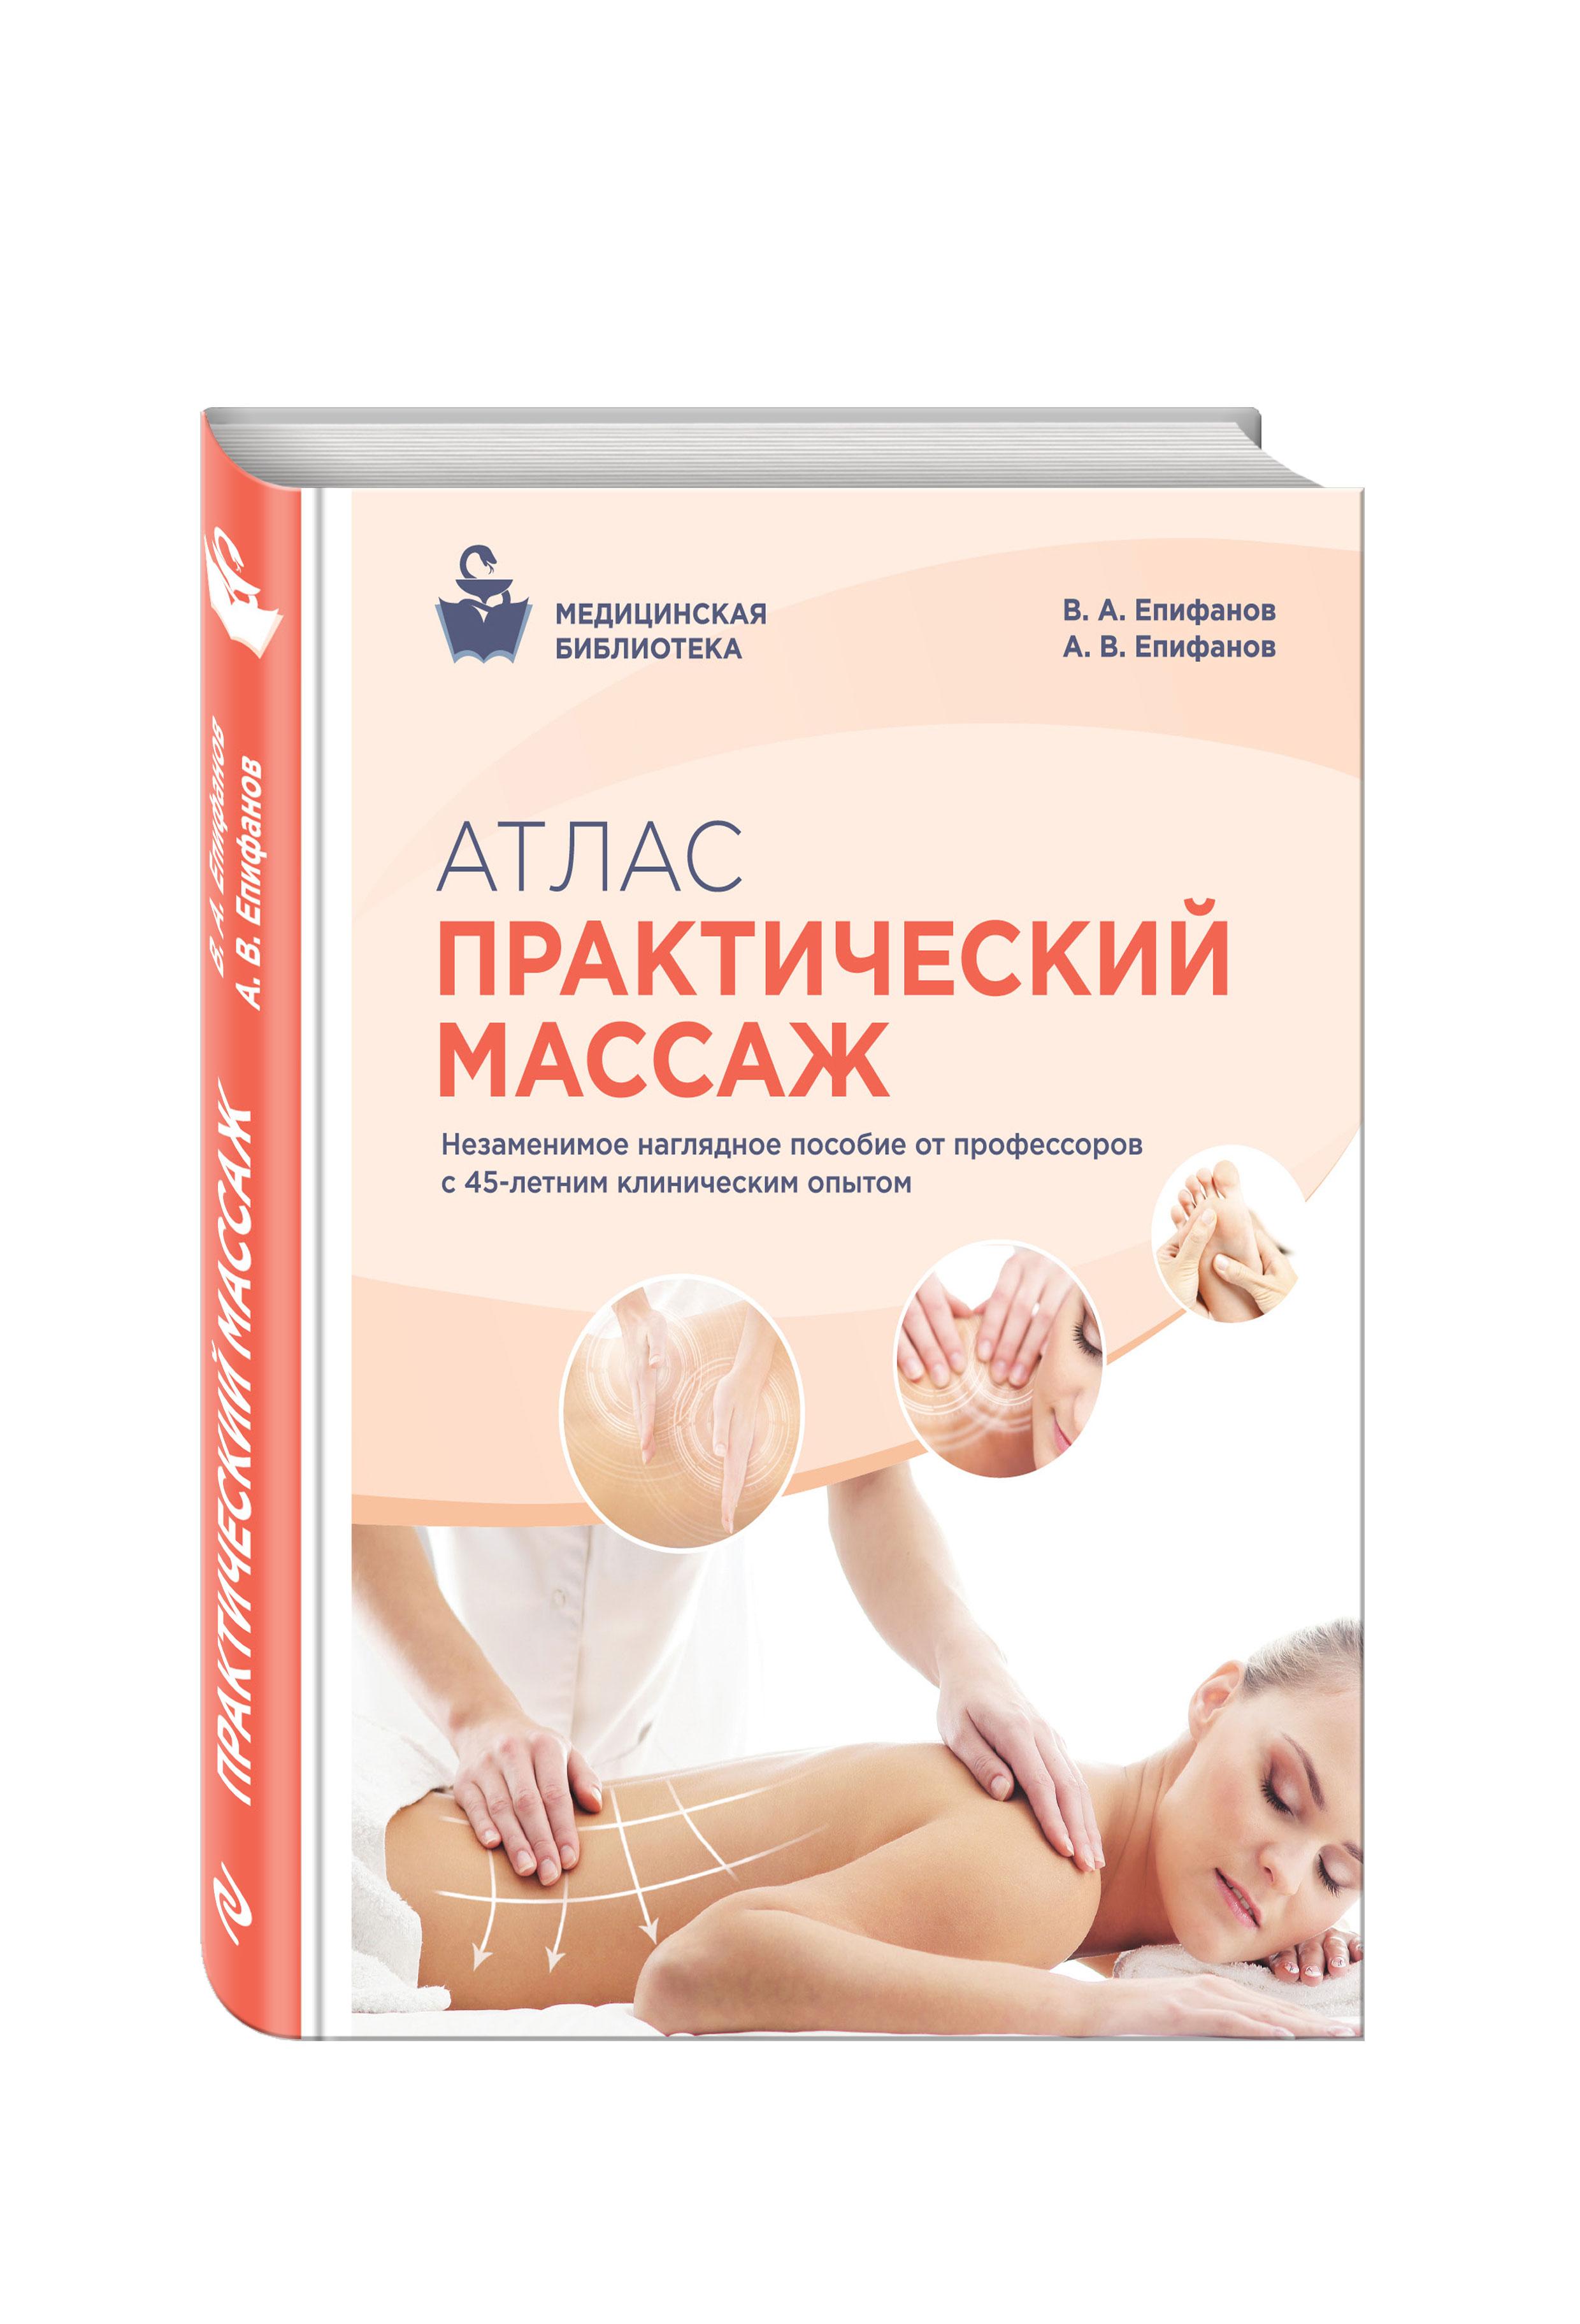 Атлас: Практический массаж от book24.ru